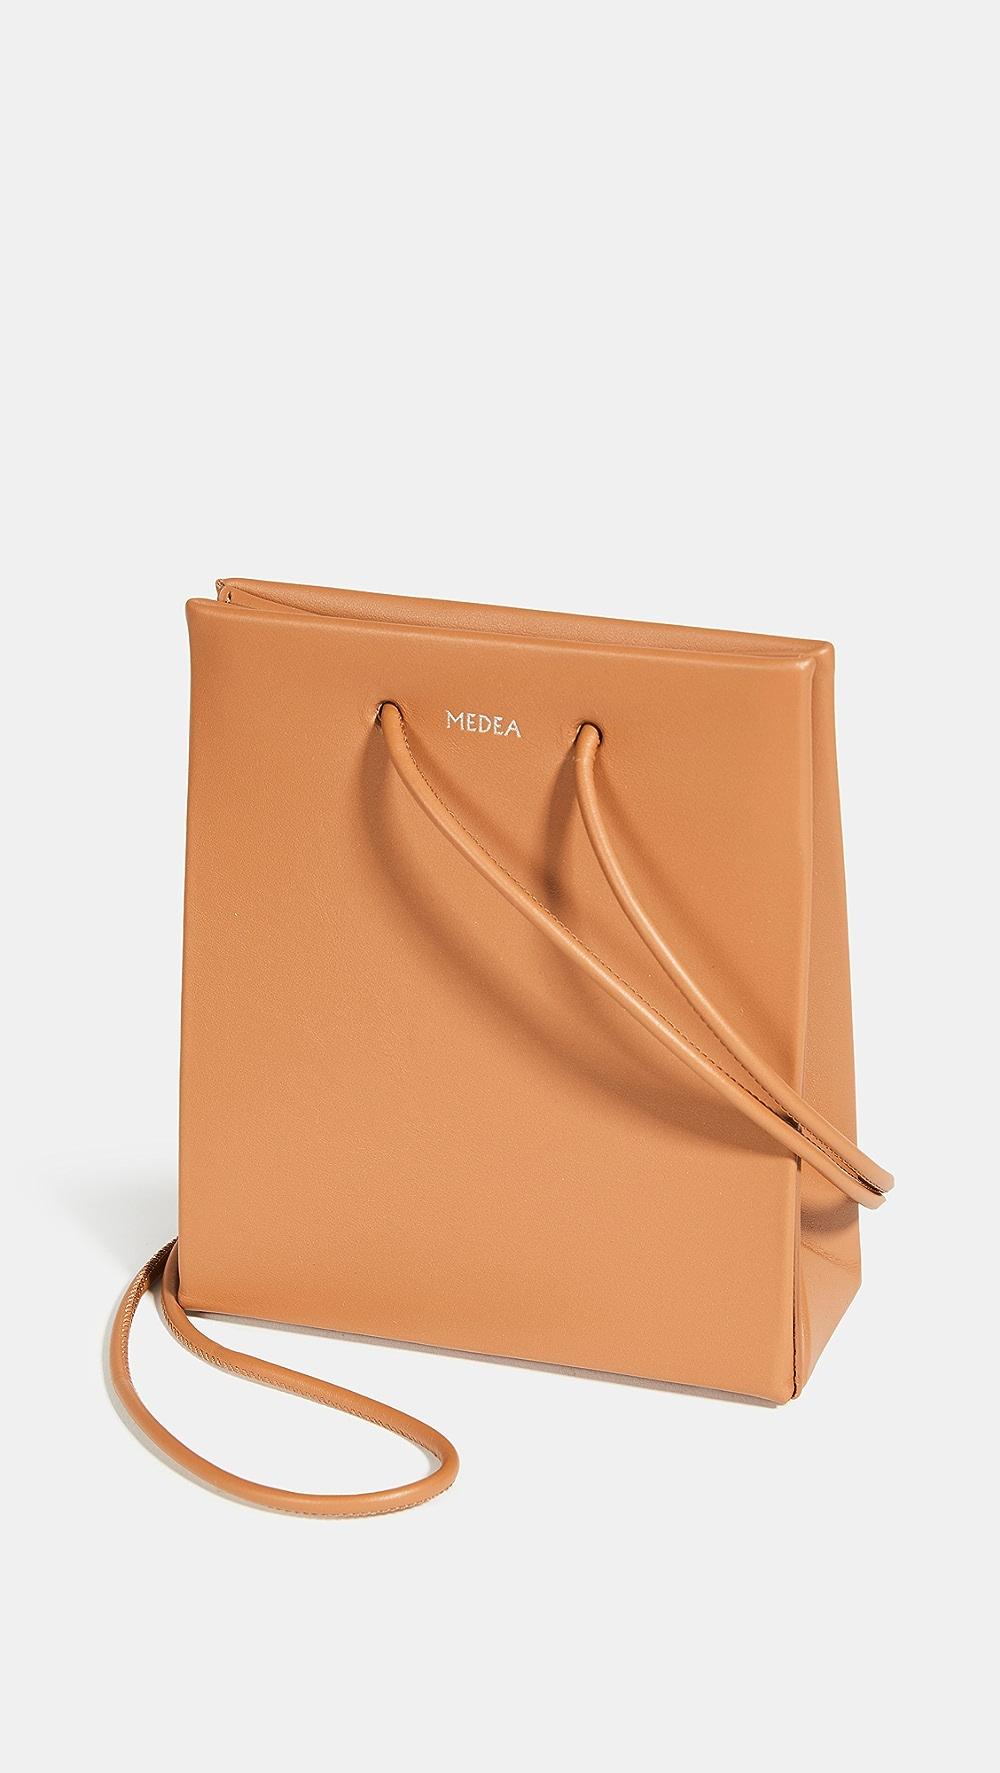 100% True Medea - Short Medea Prima Crossbody Bag Fashionable And Attractive Packages